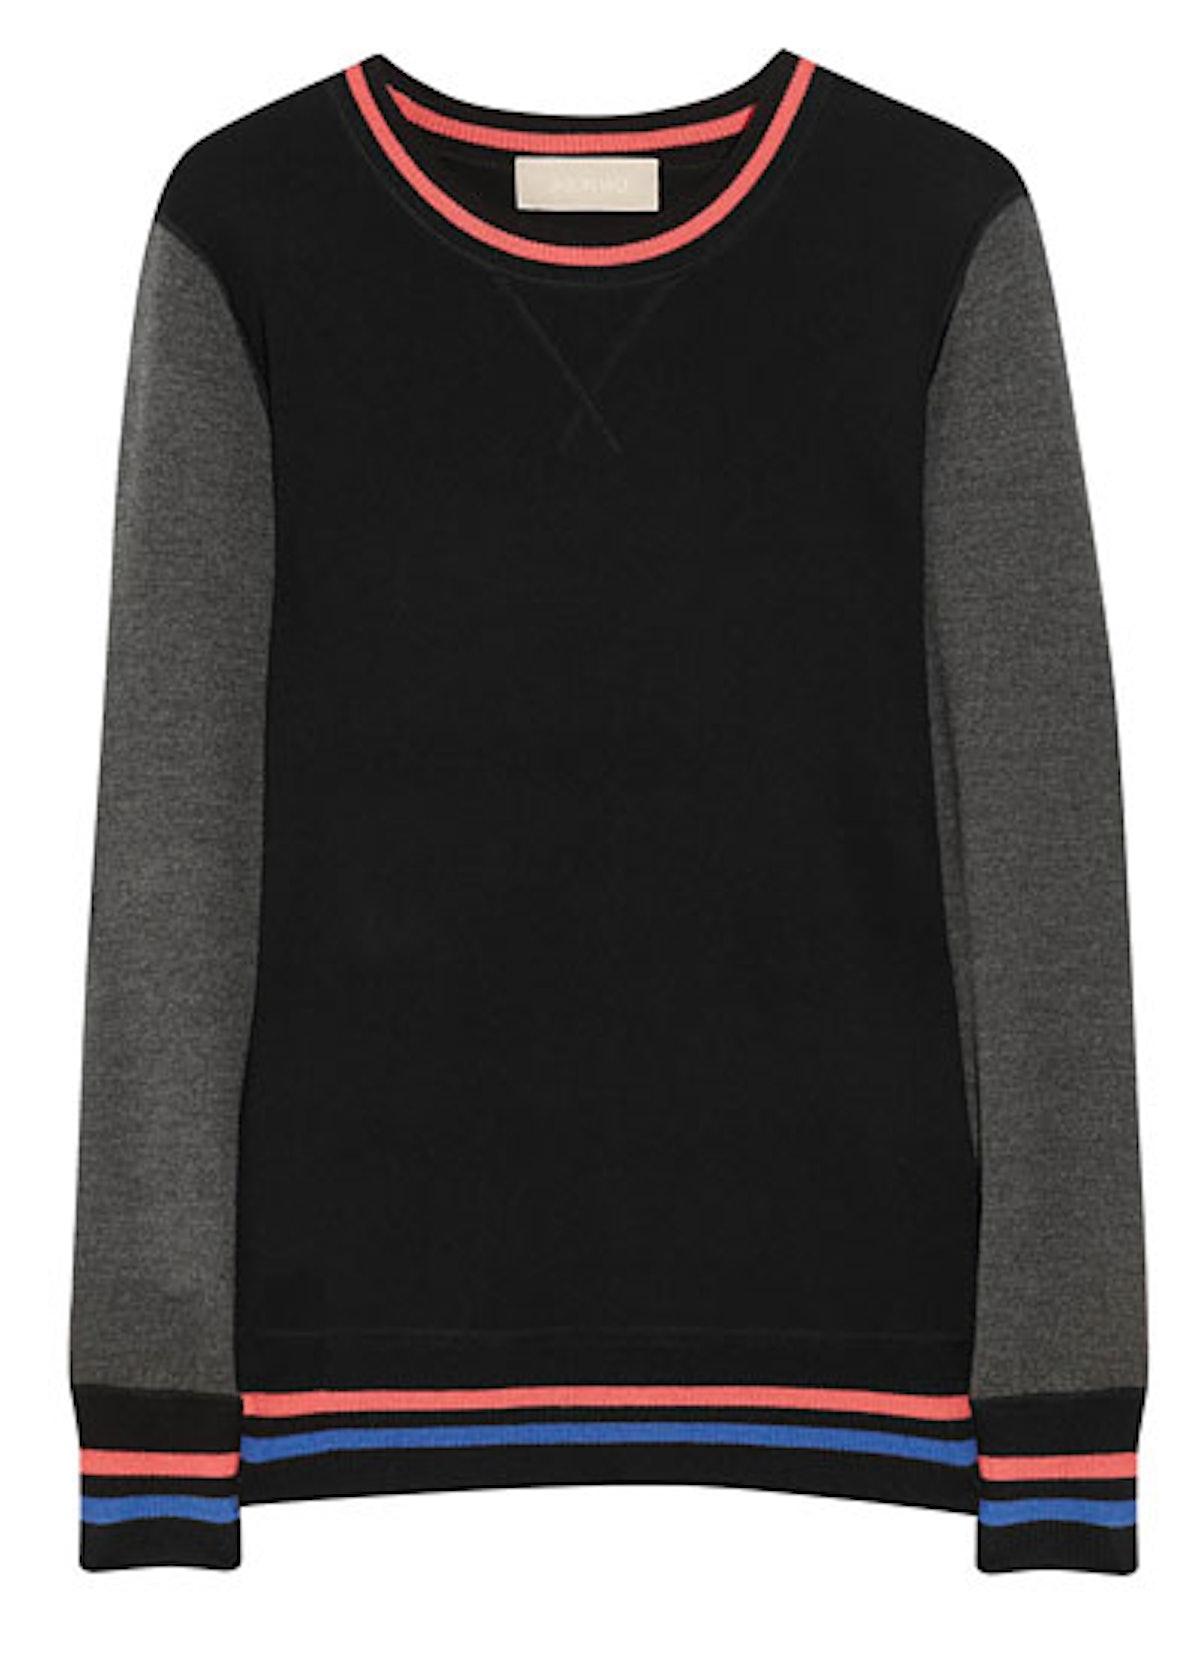 fass-graphic-knits-09-v.jpg